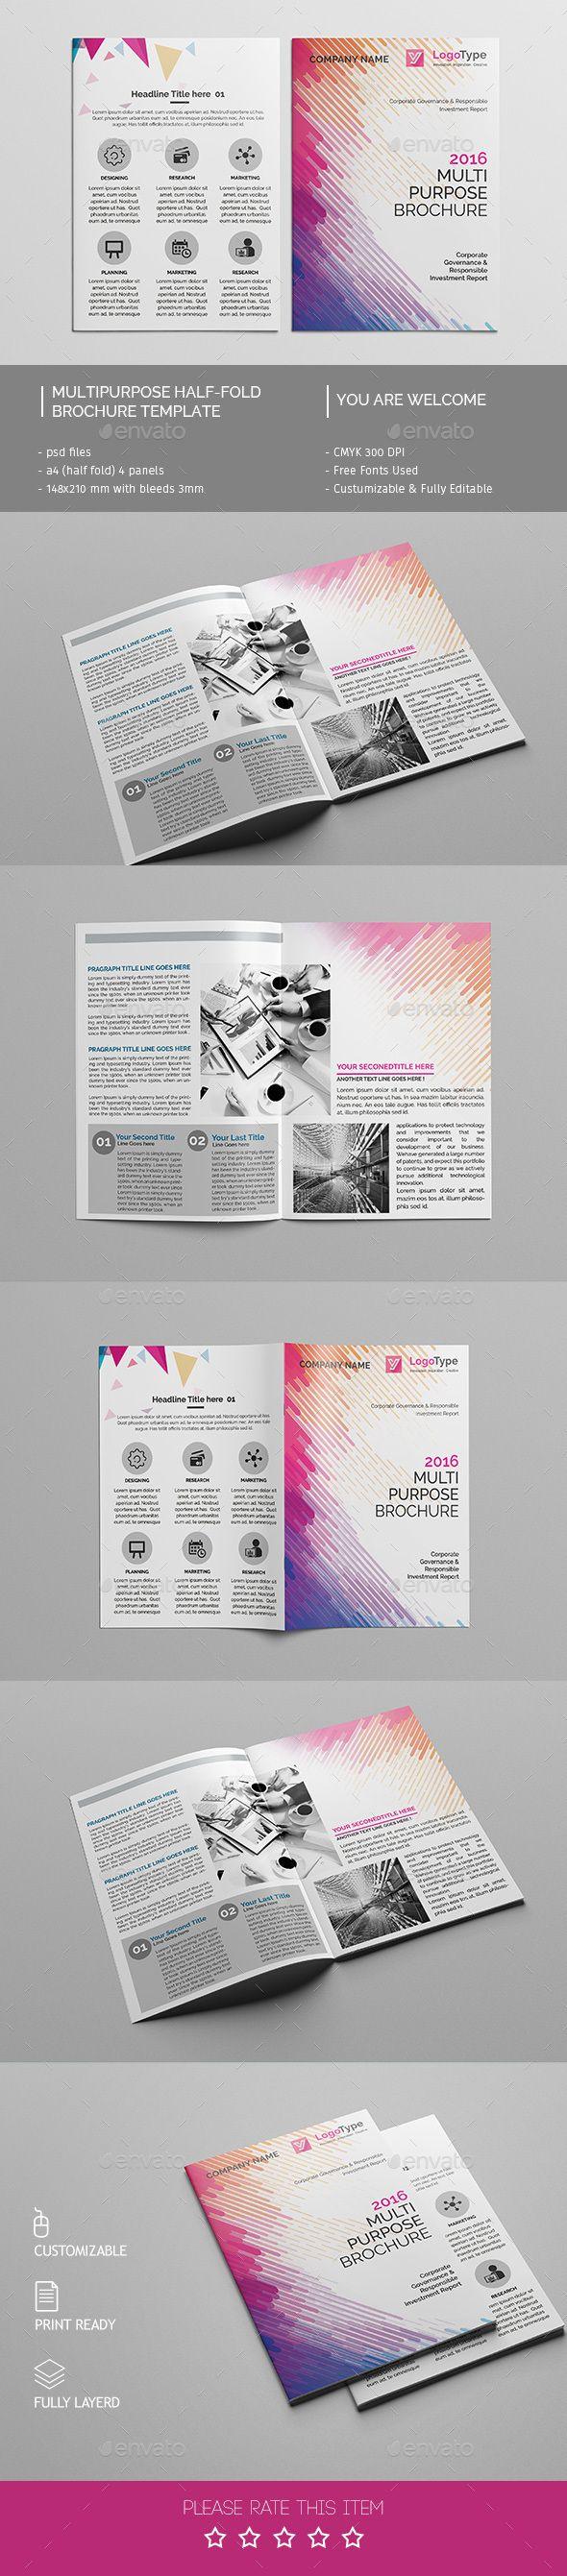 Corporate Bi-fold Brochure Template PSD #design Download: http://graphicriver.net/item/corporate-bifold-brochure-template-04/14310715?ref=ksioks